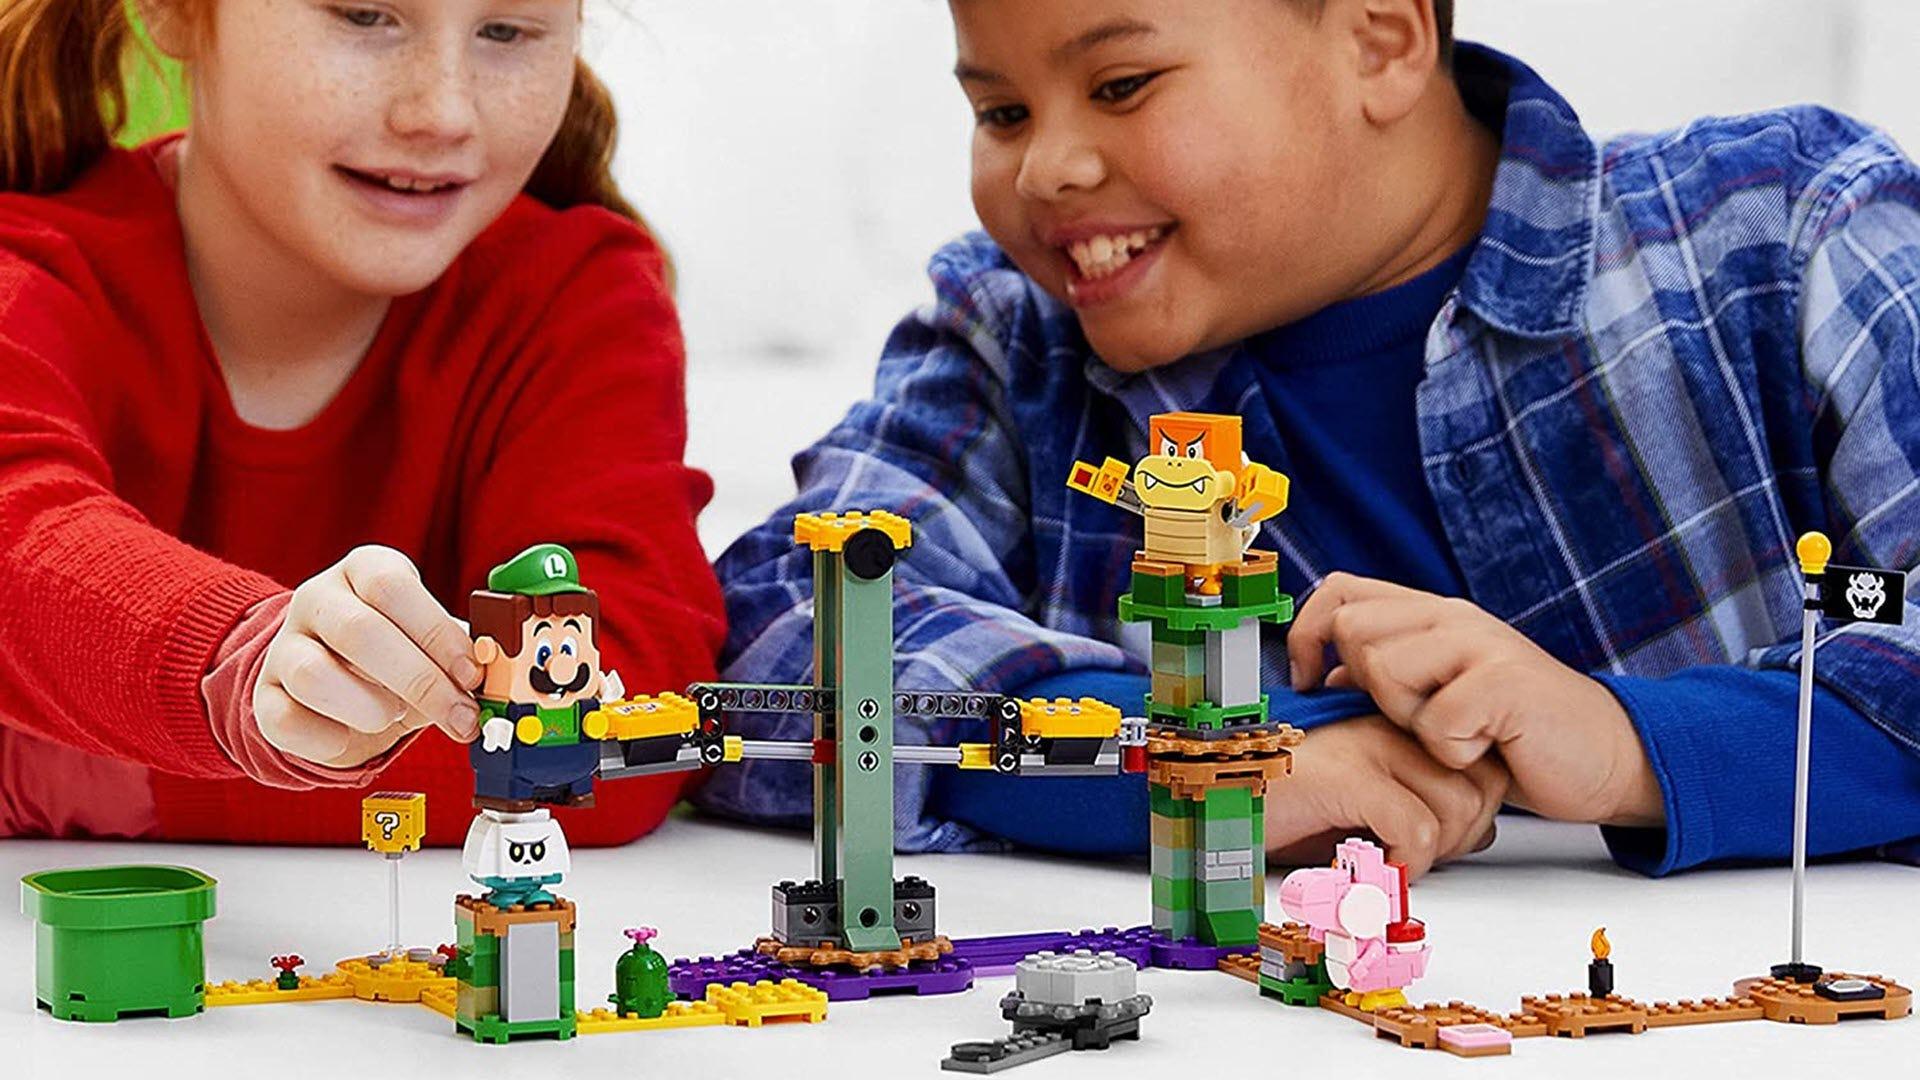 A LEGO Luigi course with Boom Boom, Pink Yoshi, and Bone Goomba